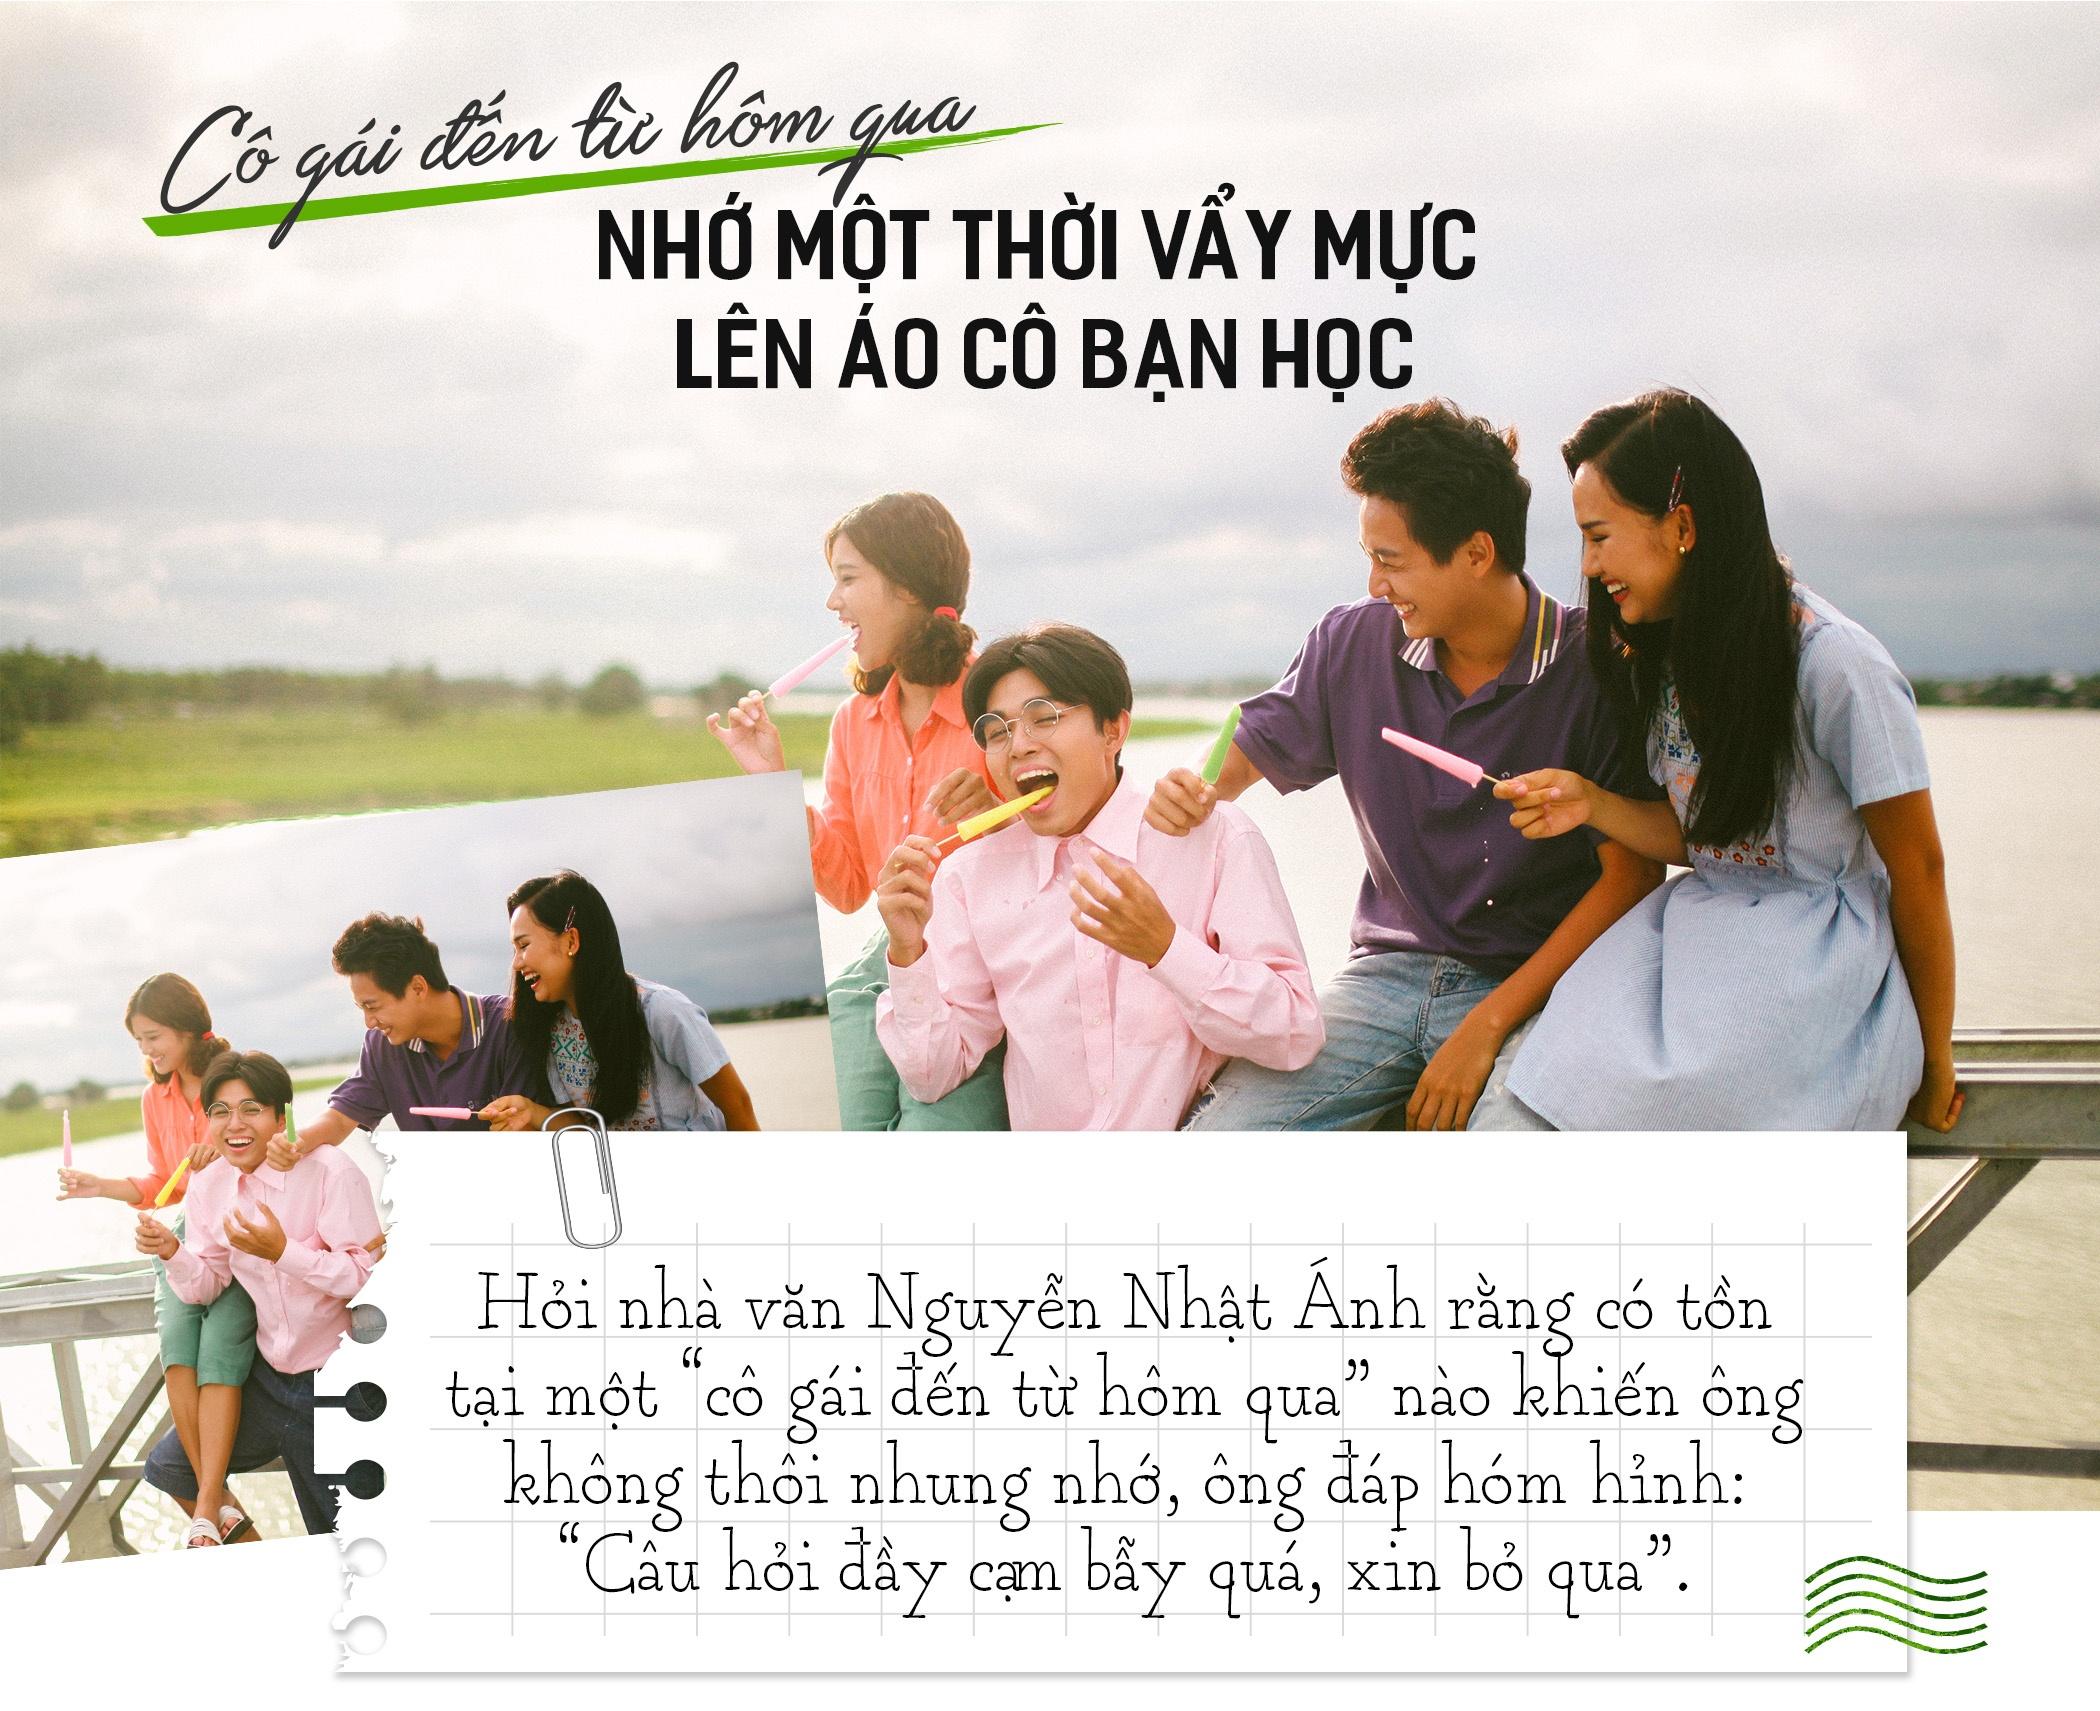 'Co gai den tu hom qua' - nho mot thoi vay muc len ao co ban hoc hinh anh 1